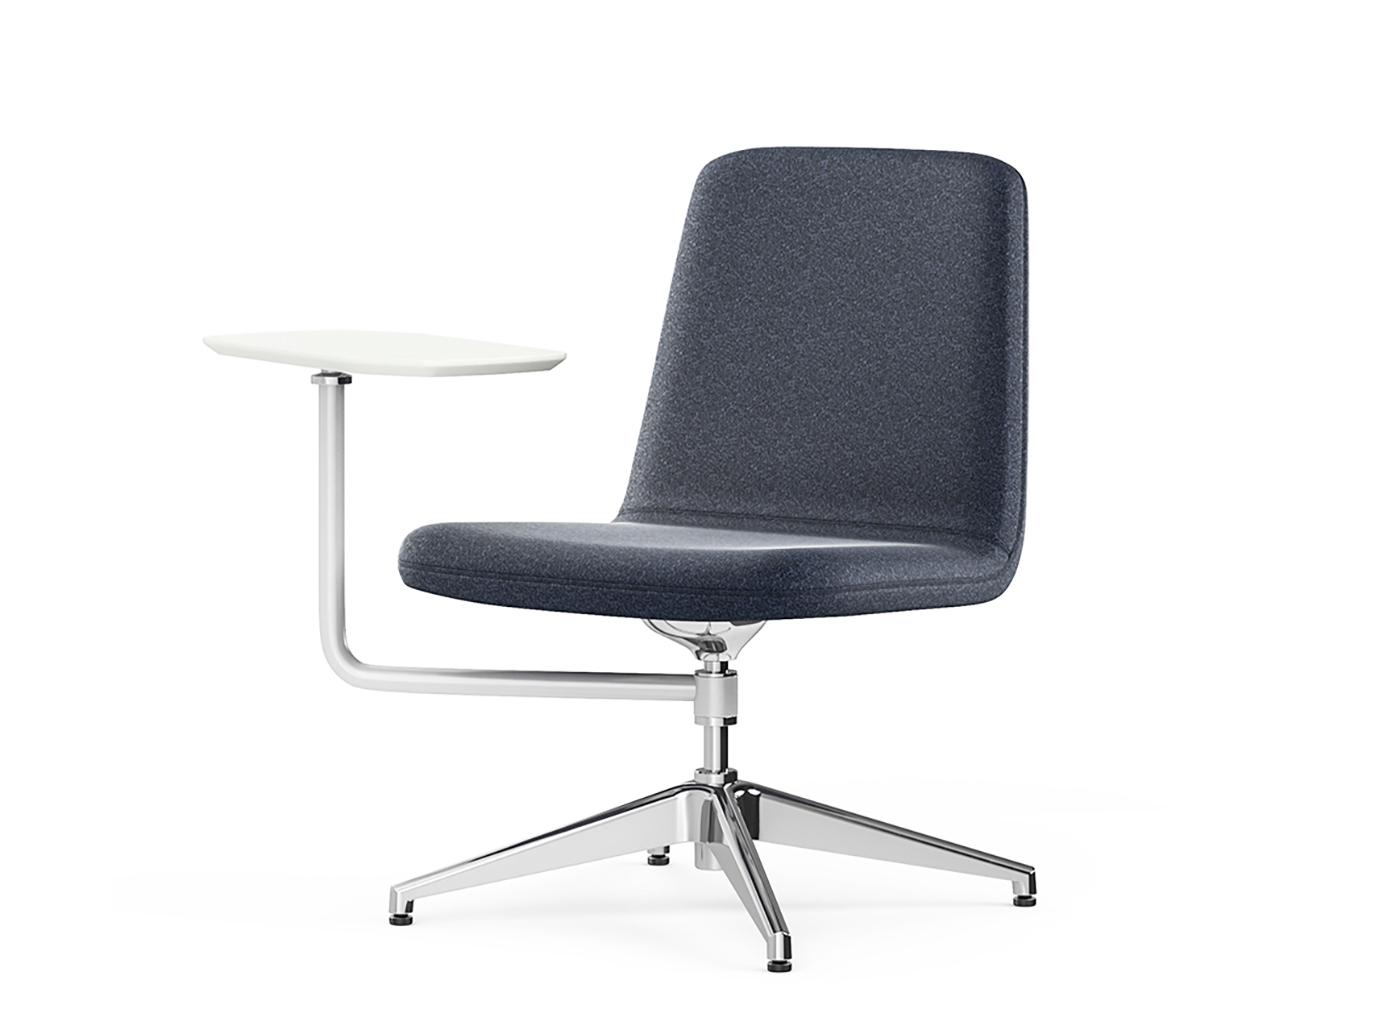 //.studiofifield.com/experience/paoli-coho-seating/  sc 1 st  Behance & Paoli CO|HO on Behance